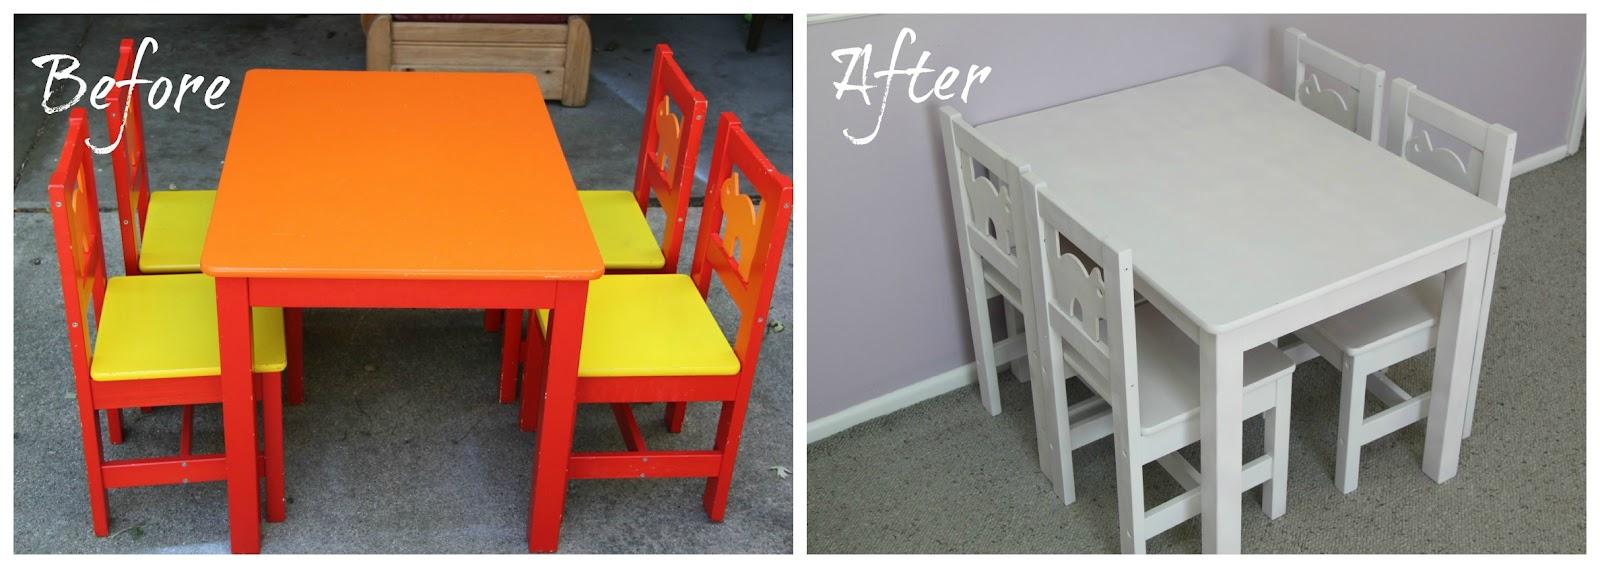 How To Paint Ikea Laminate Furniture Tutorial